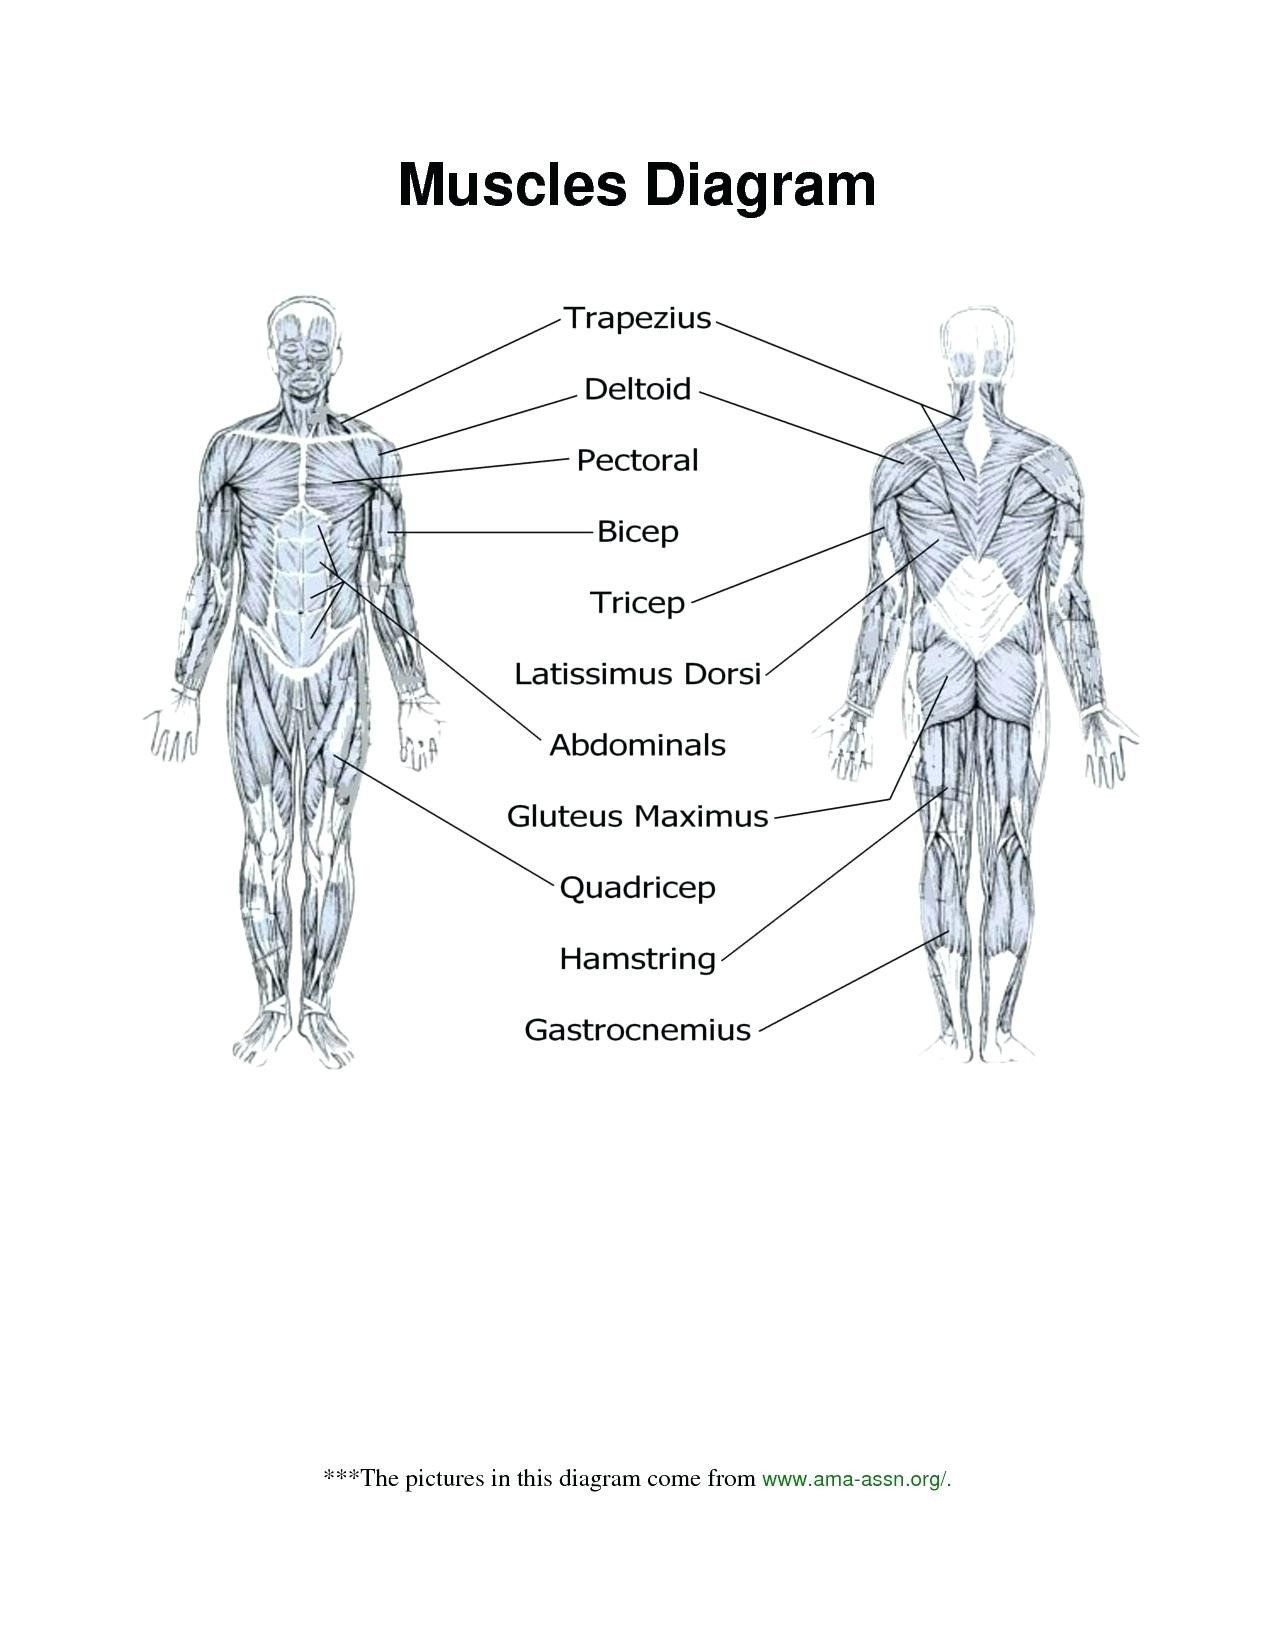 20 Bones And Muscles Worksheet Free Worksheets In 2021 Human Body Muscles Skeletal System Worksheet Muscle Diagram